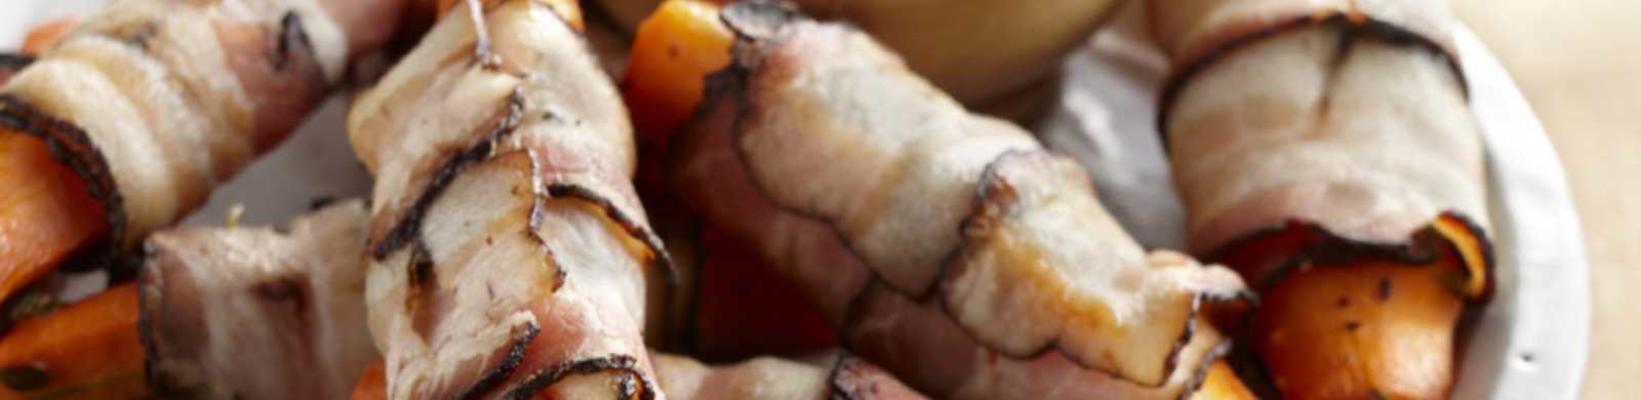 crunchy carrot snack